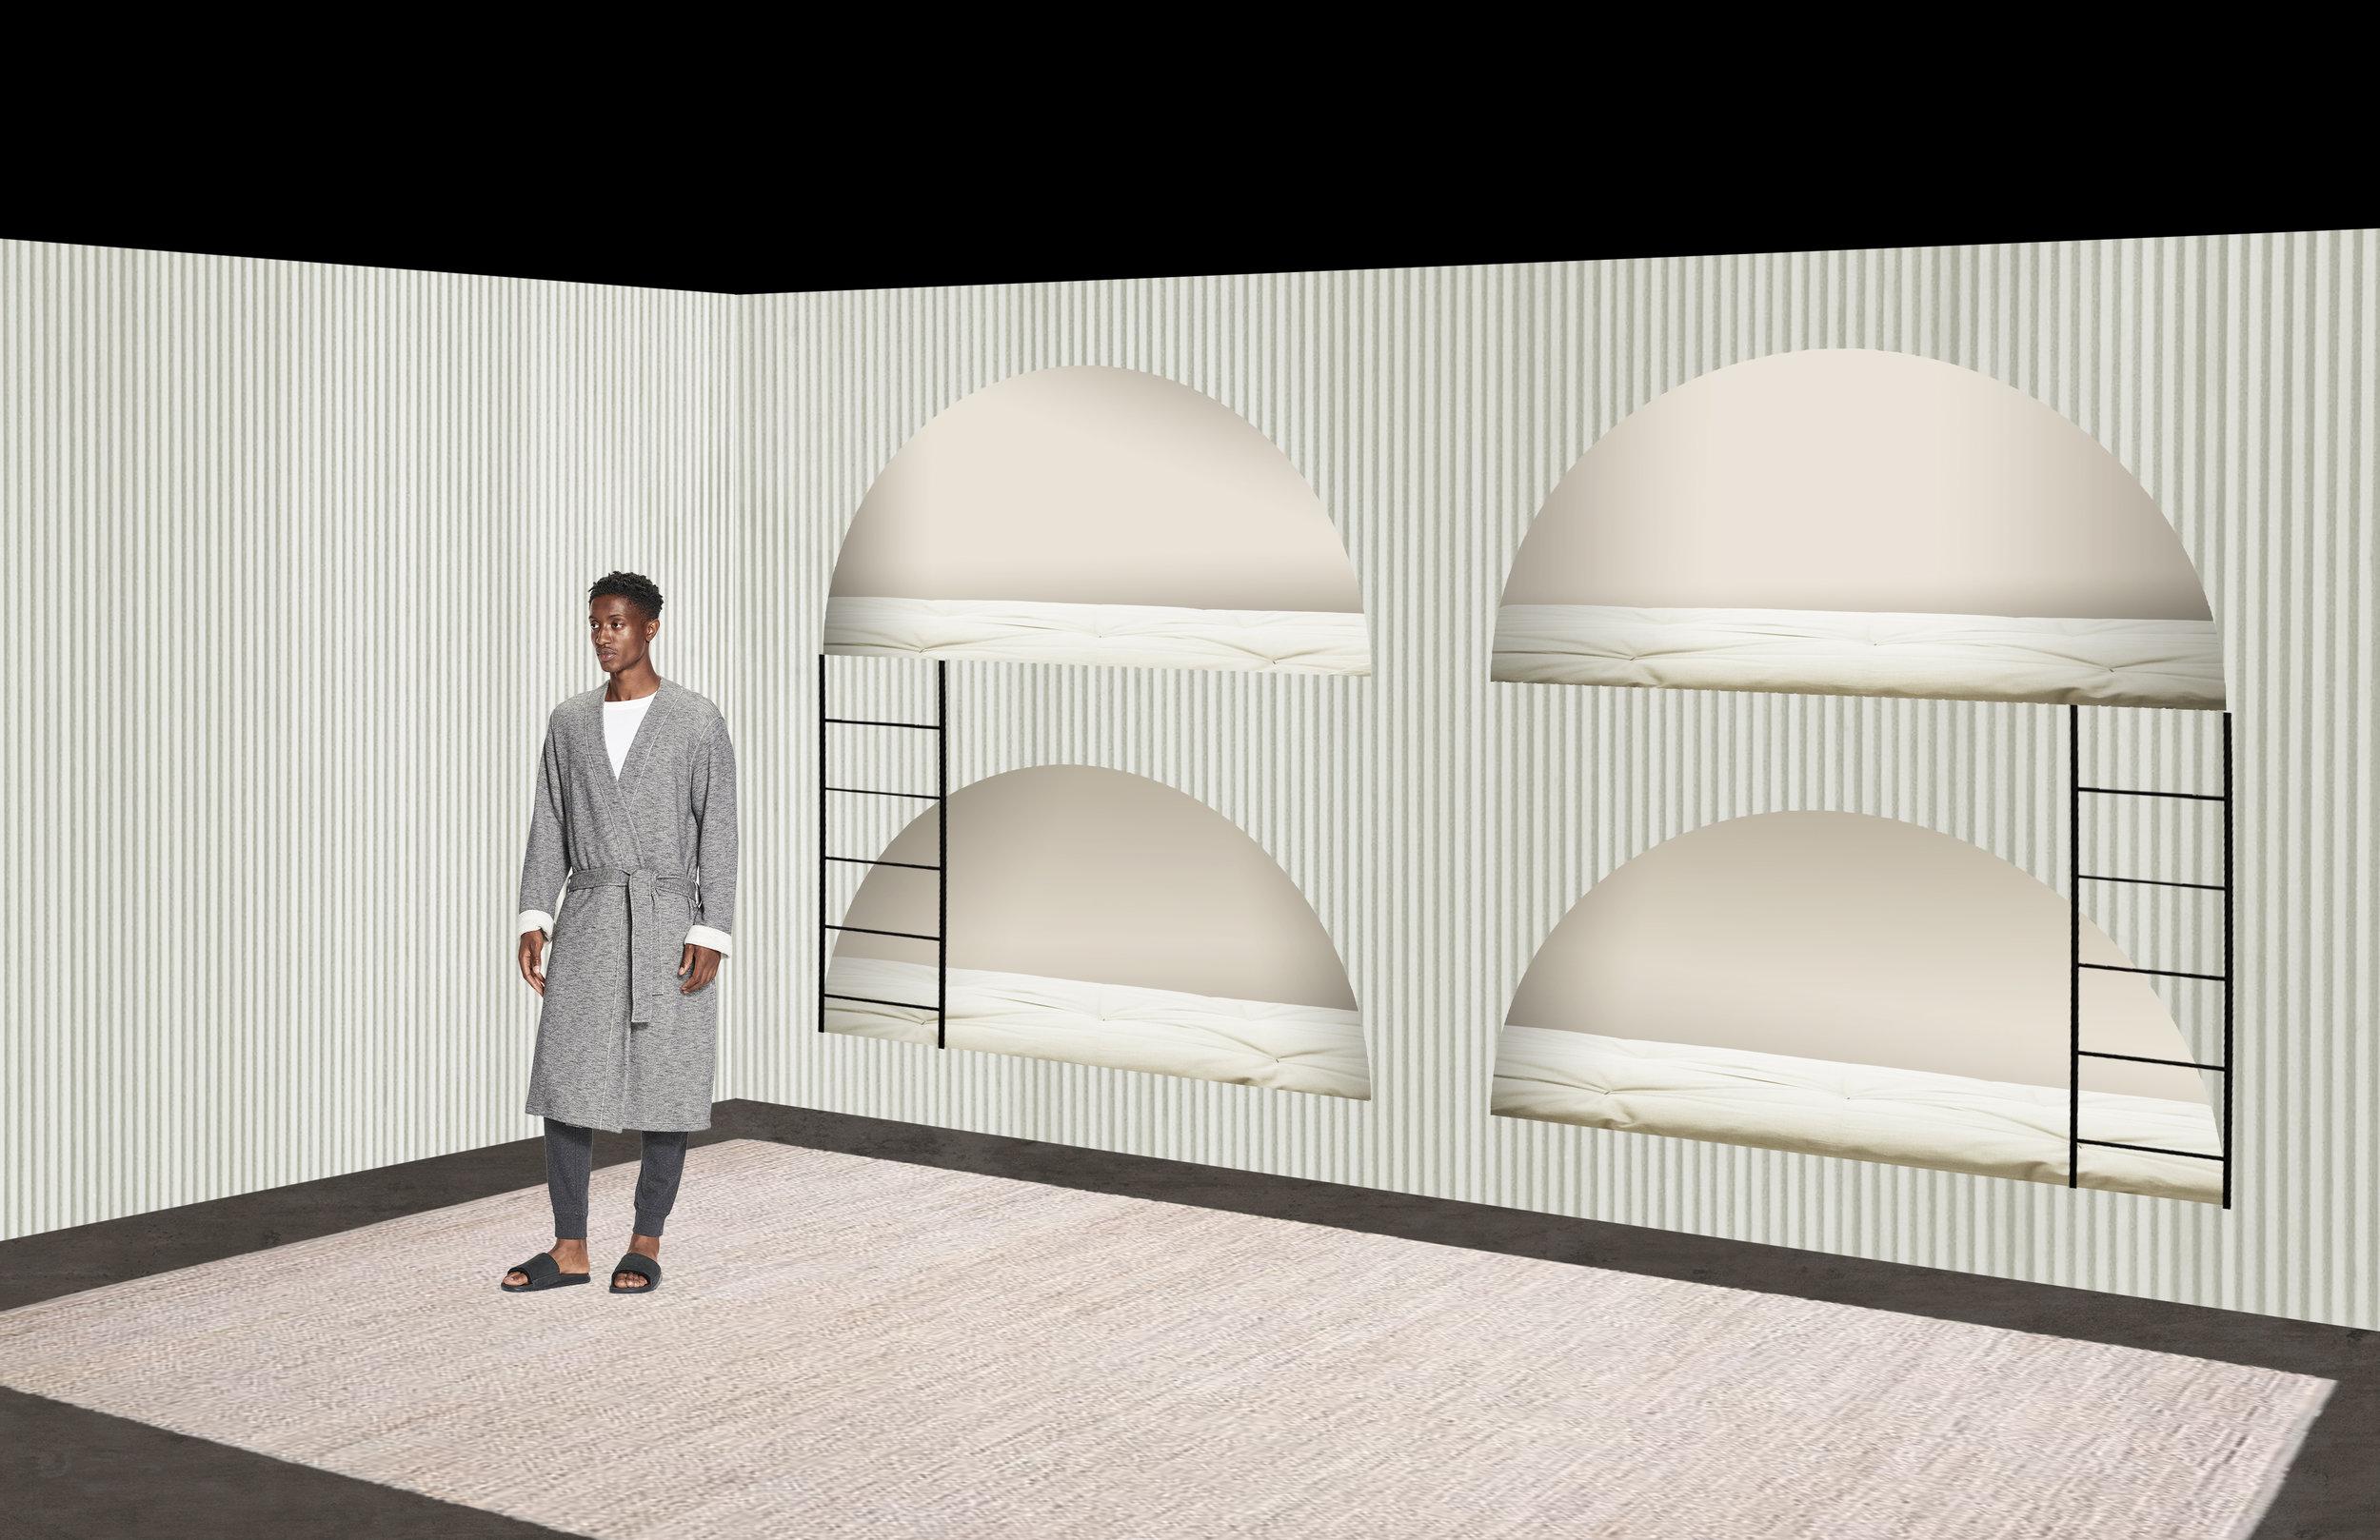 Lounge Room, Asheville, NC   Conceptual Design Mock-Up